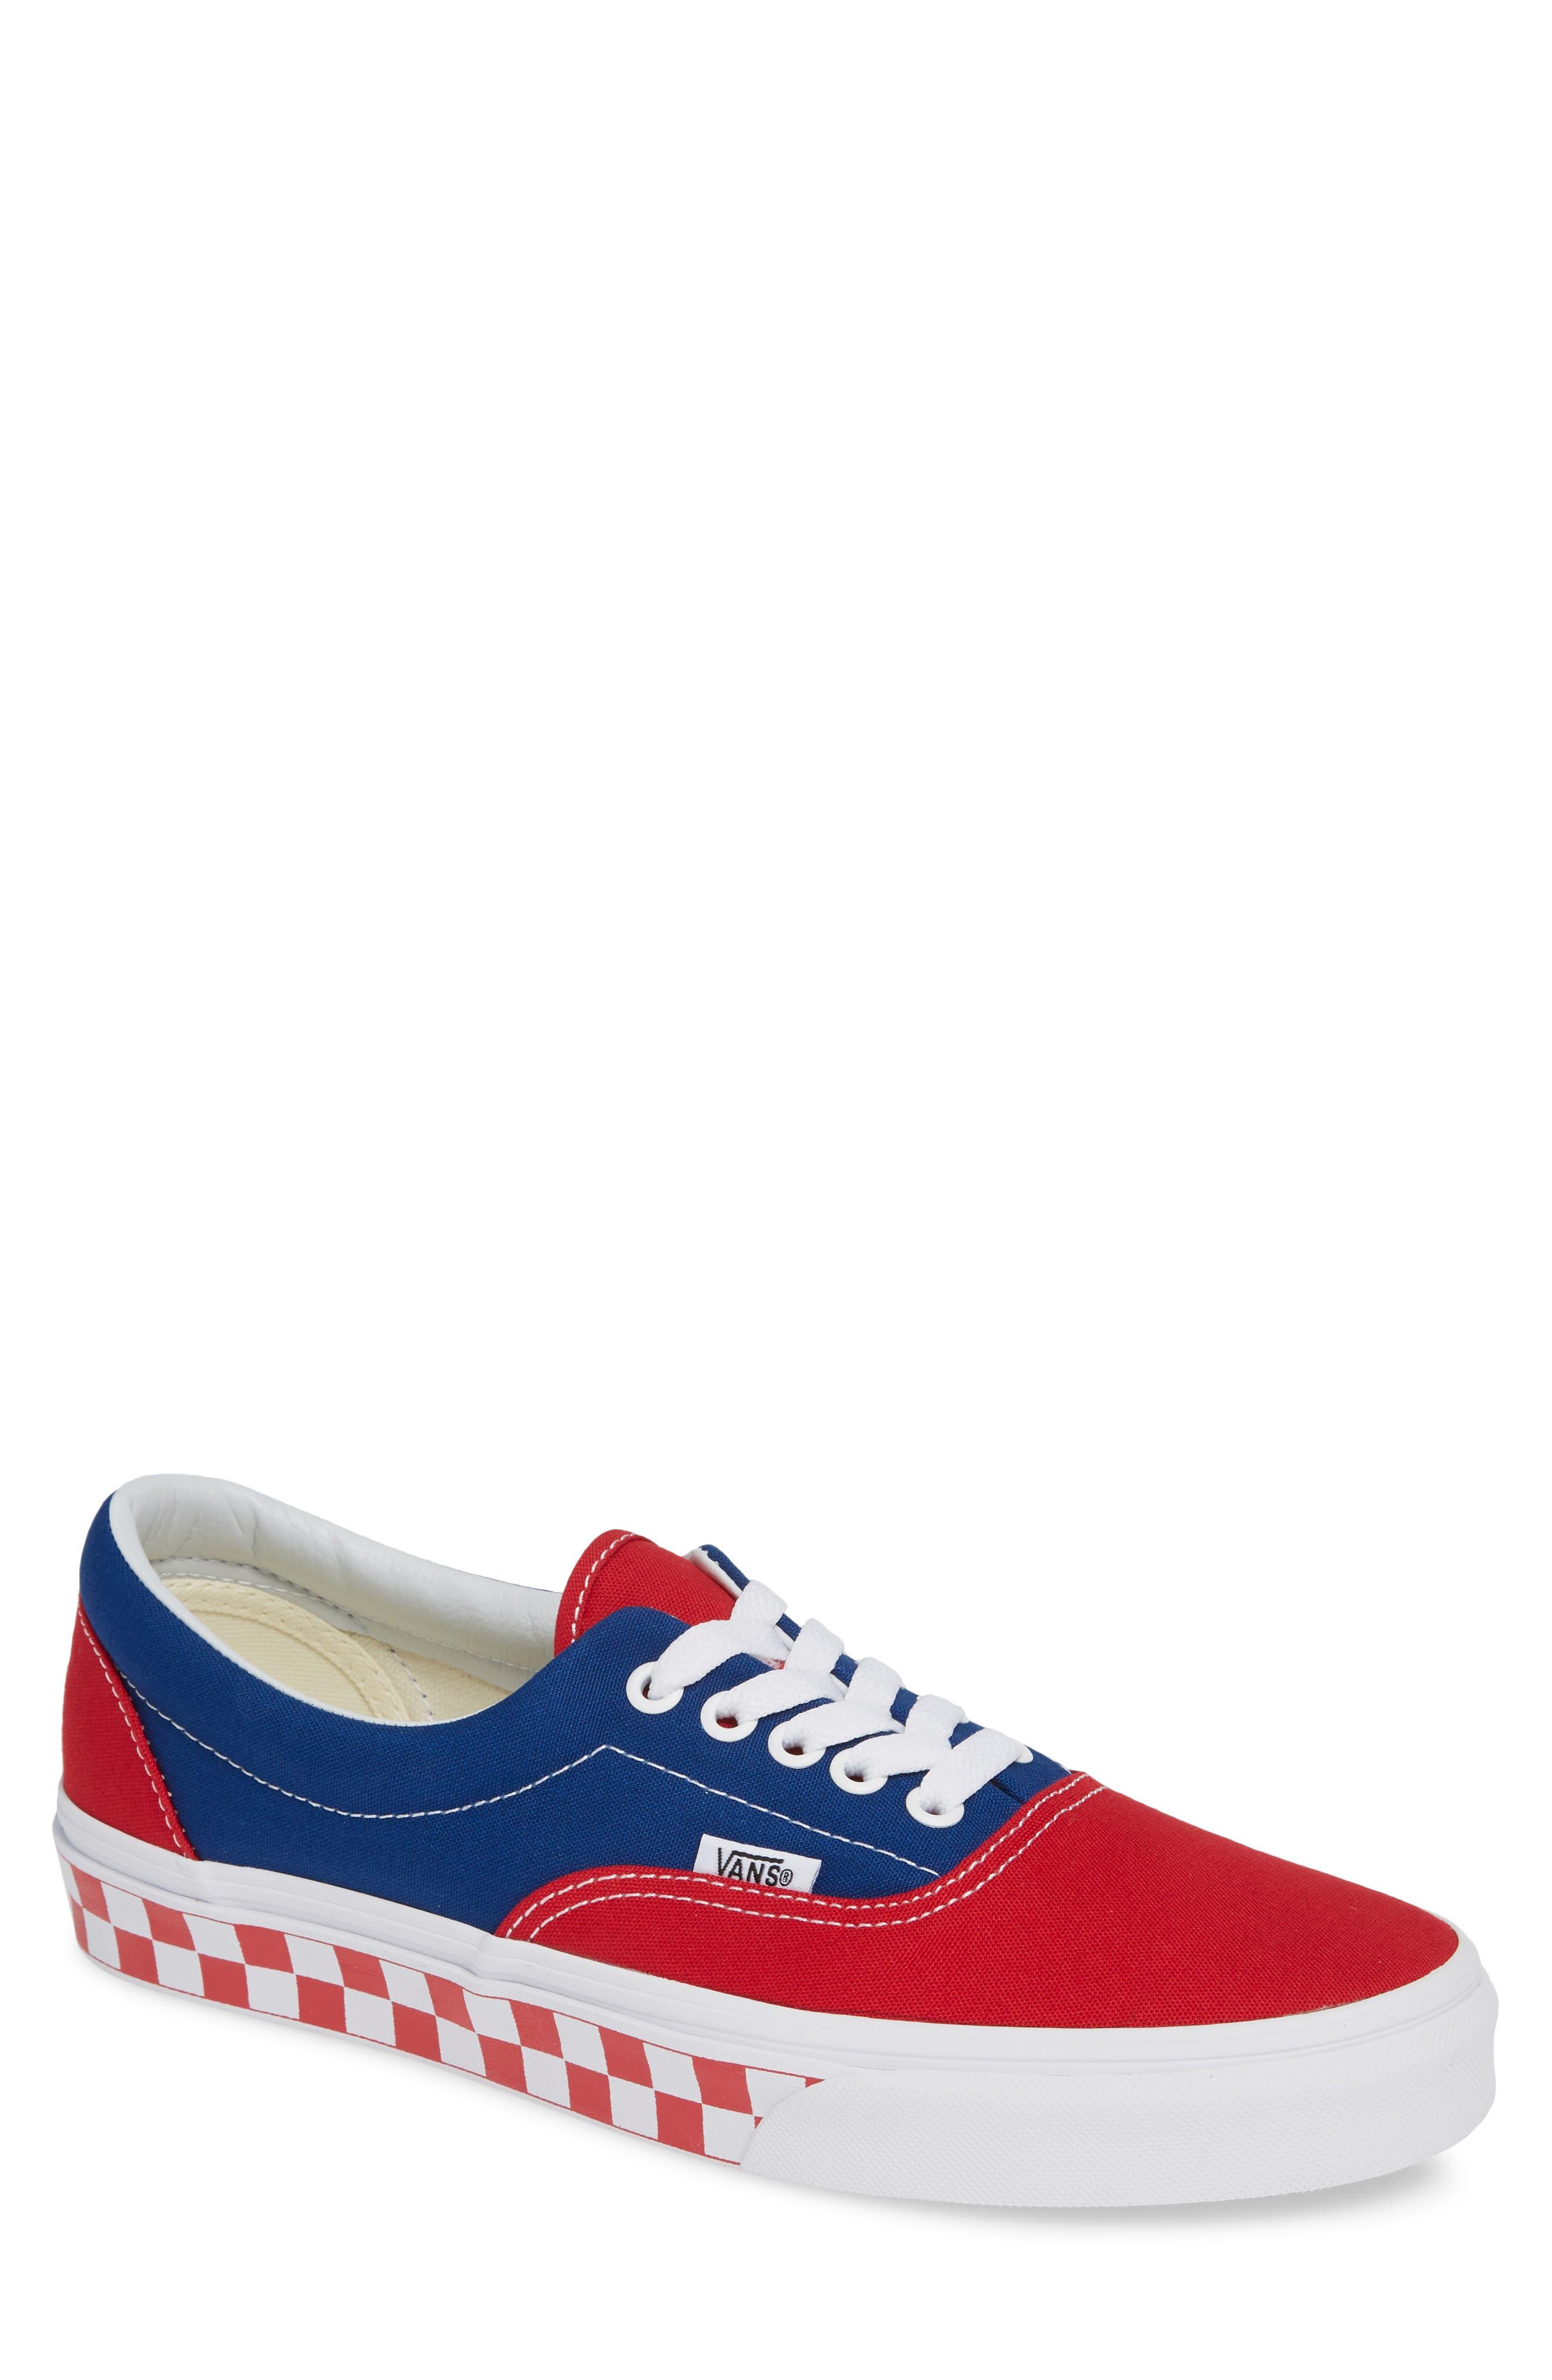 BMX Checkerboard Era Sneaker,                             Main thumbnail 1, color,                             BLUE/ RED CHECKER CANVAS